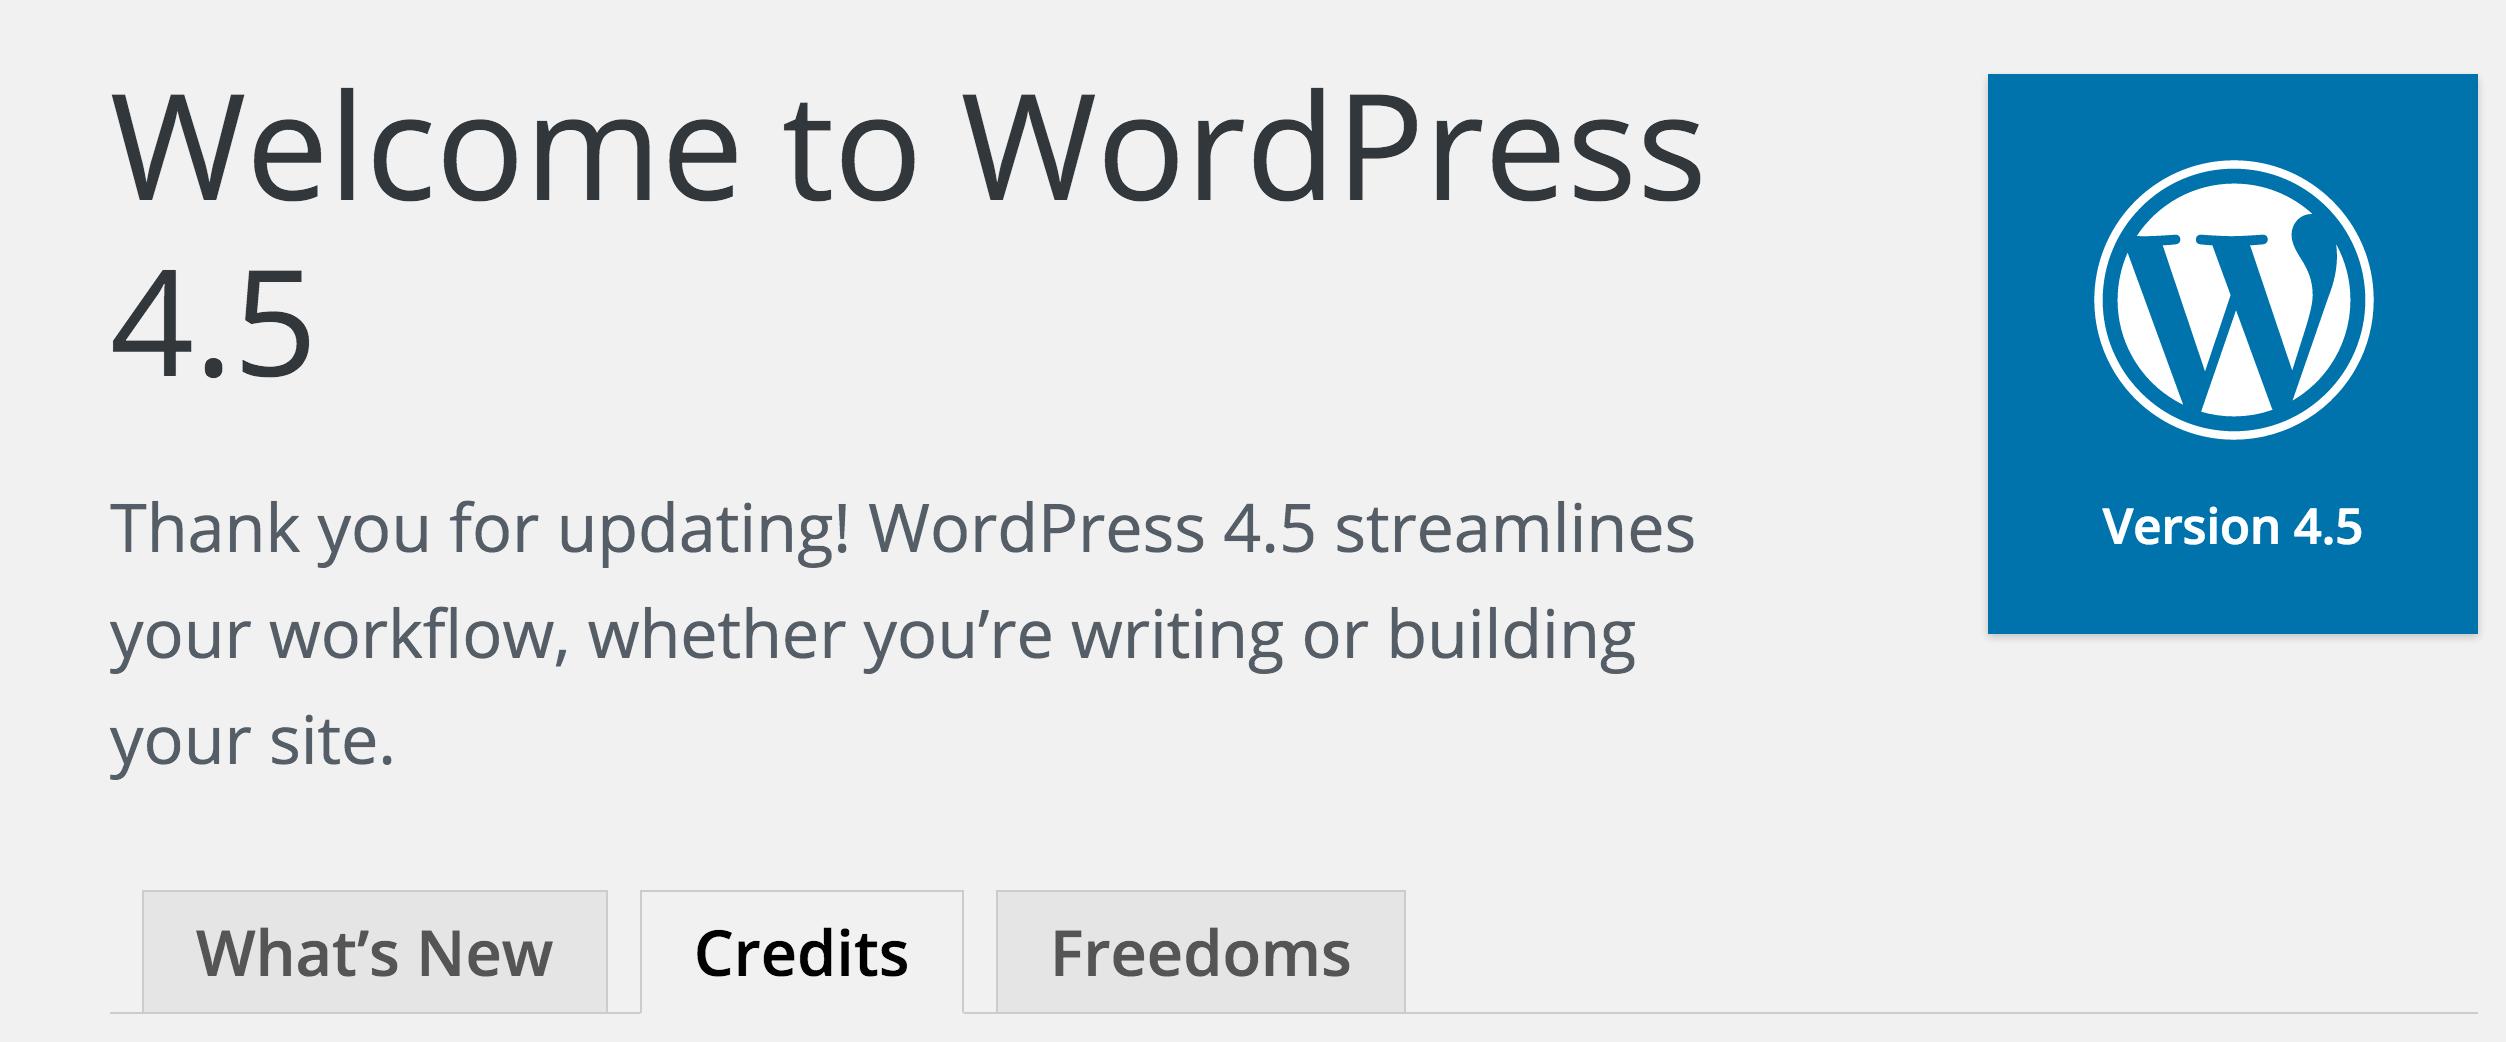 Welcome Screen WordPress 4.5